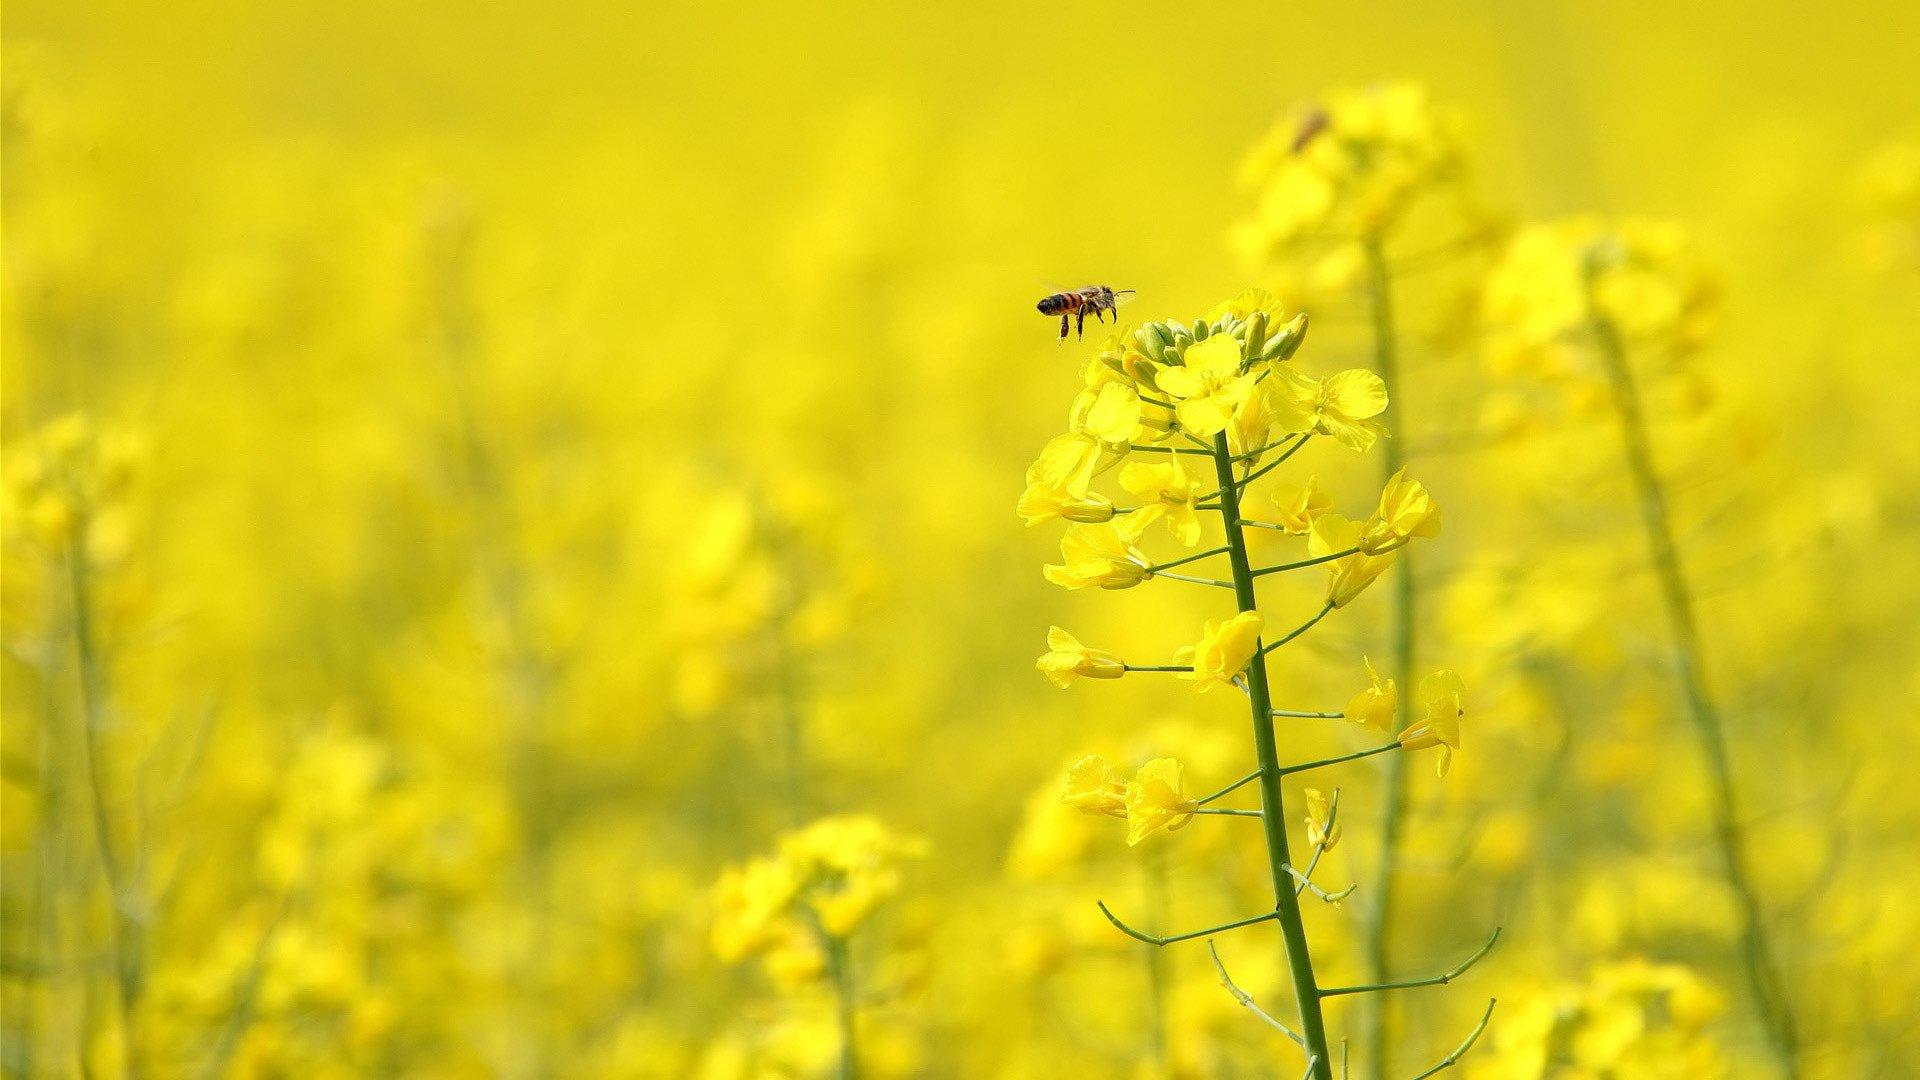 Honey bee on yellow flower wallpaper 206 1920x1080